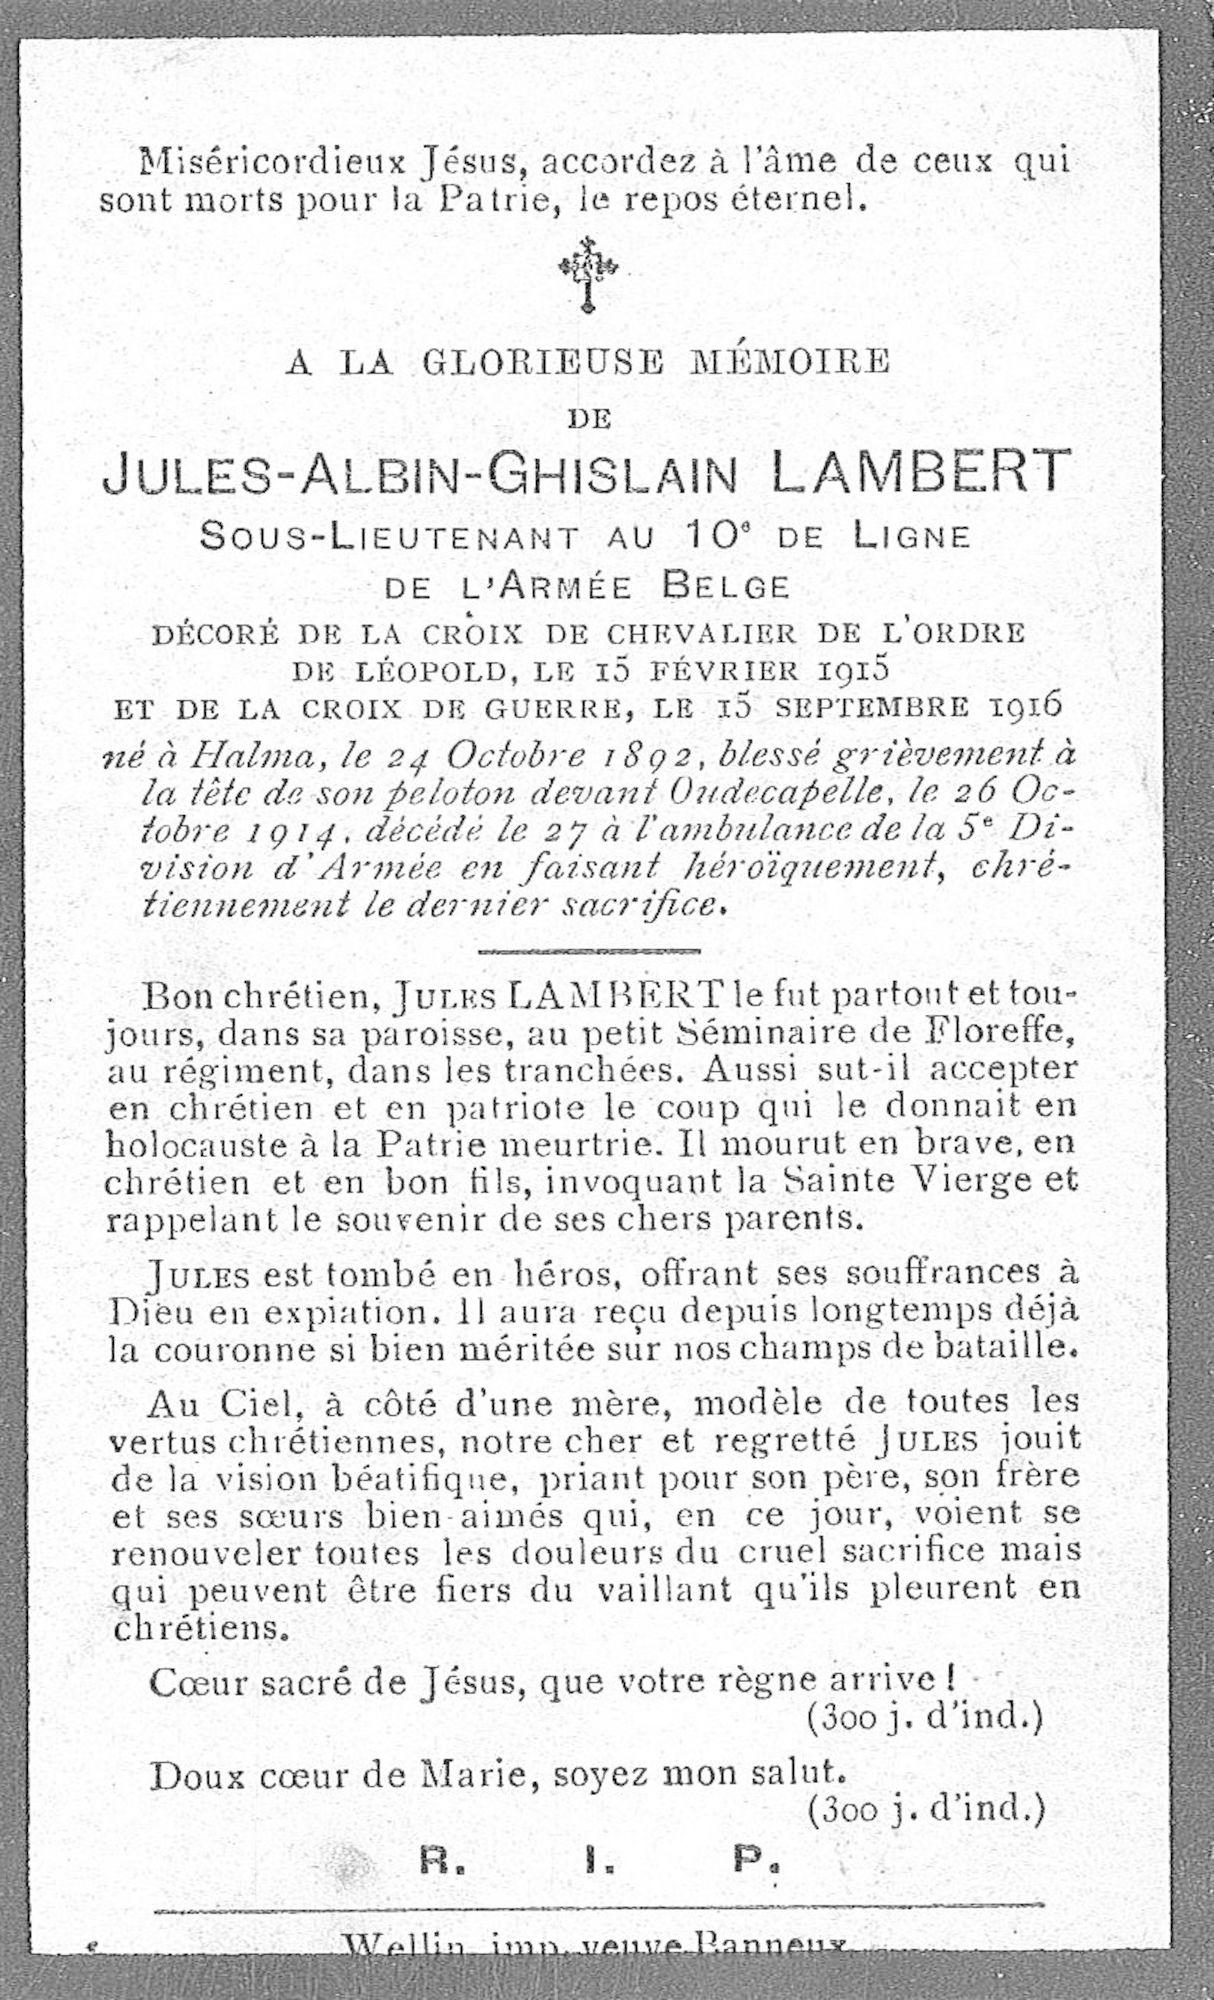 Jules-Albin-Ghislain Lambert